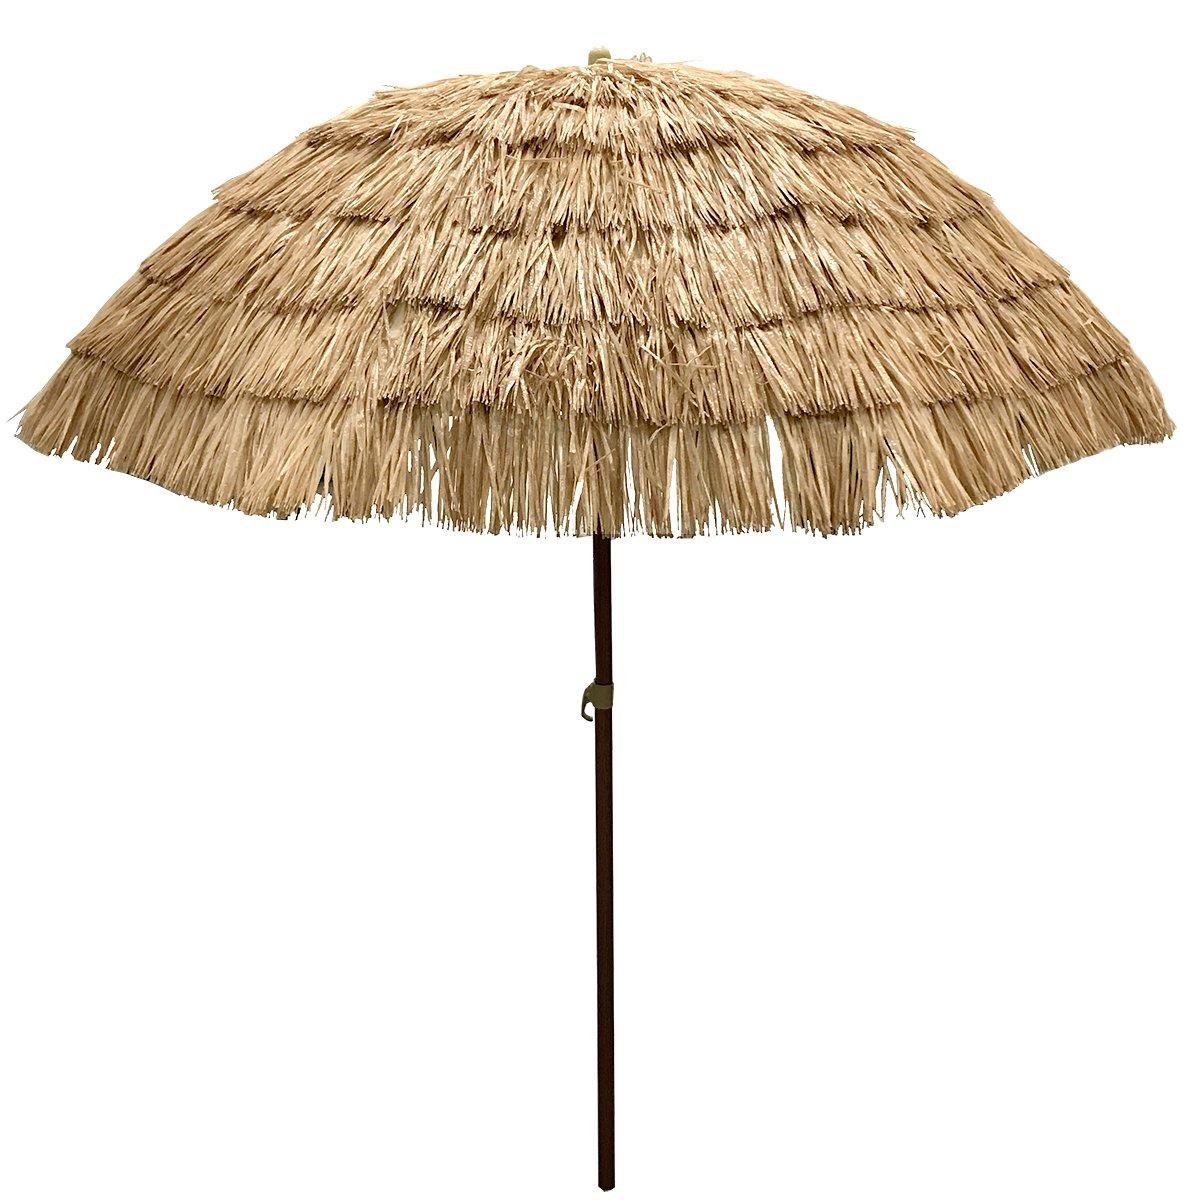 EasyGo - 8' Thatch Patio Tiki Umbrella